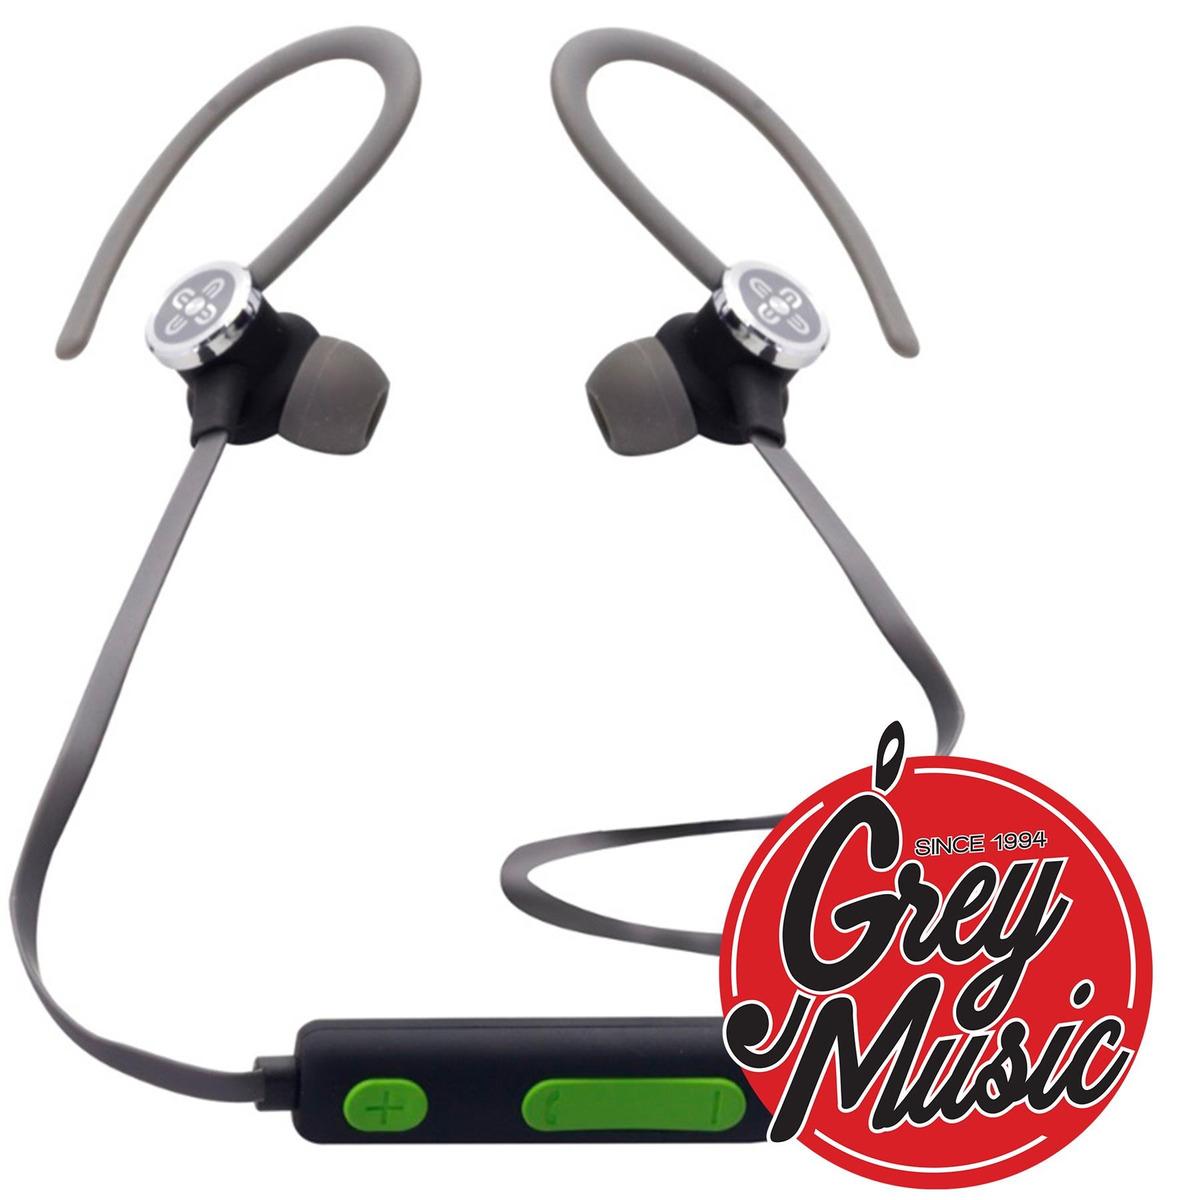 Auricular Moki Acc Hpexact In Ear Exo Active Bluetooth Black